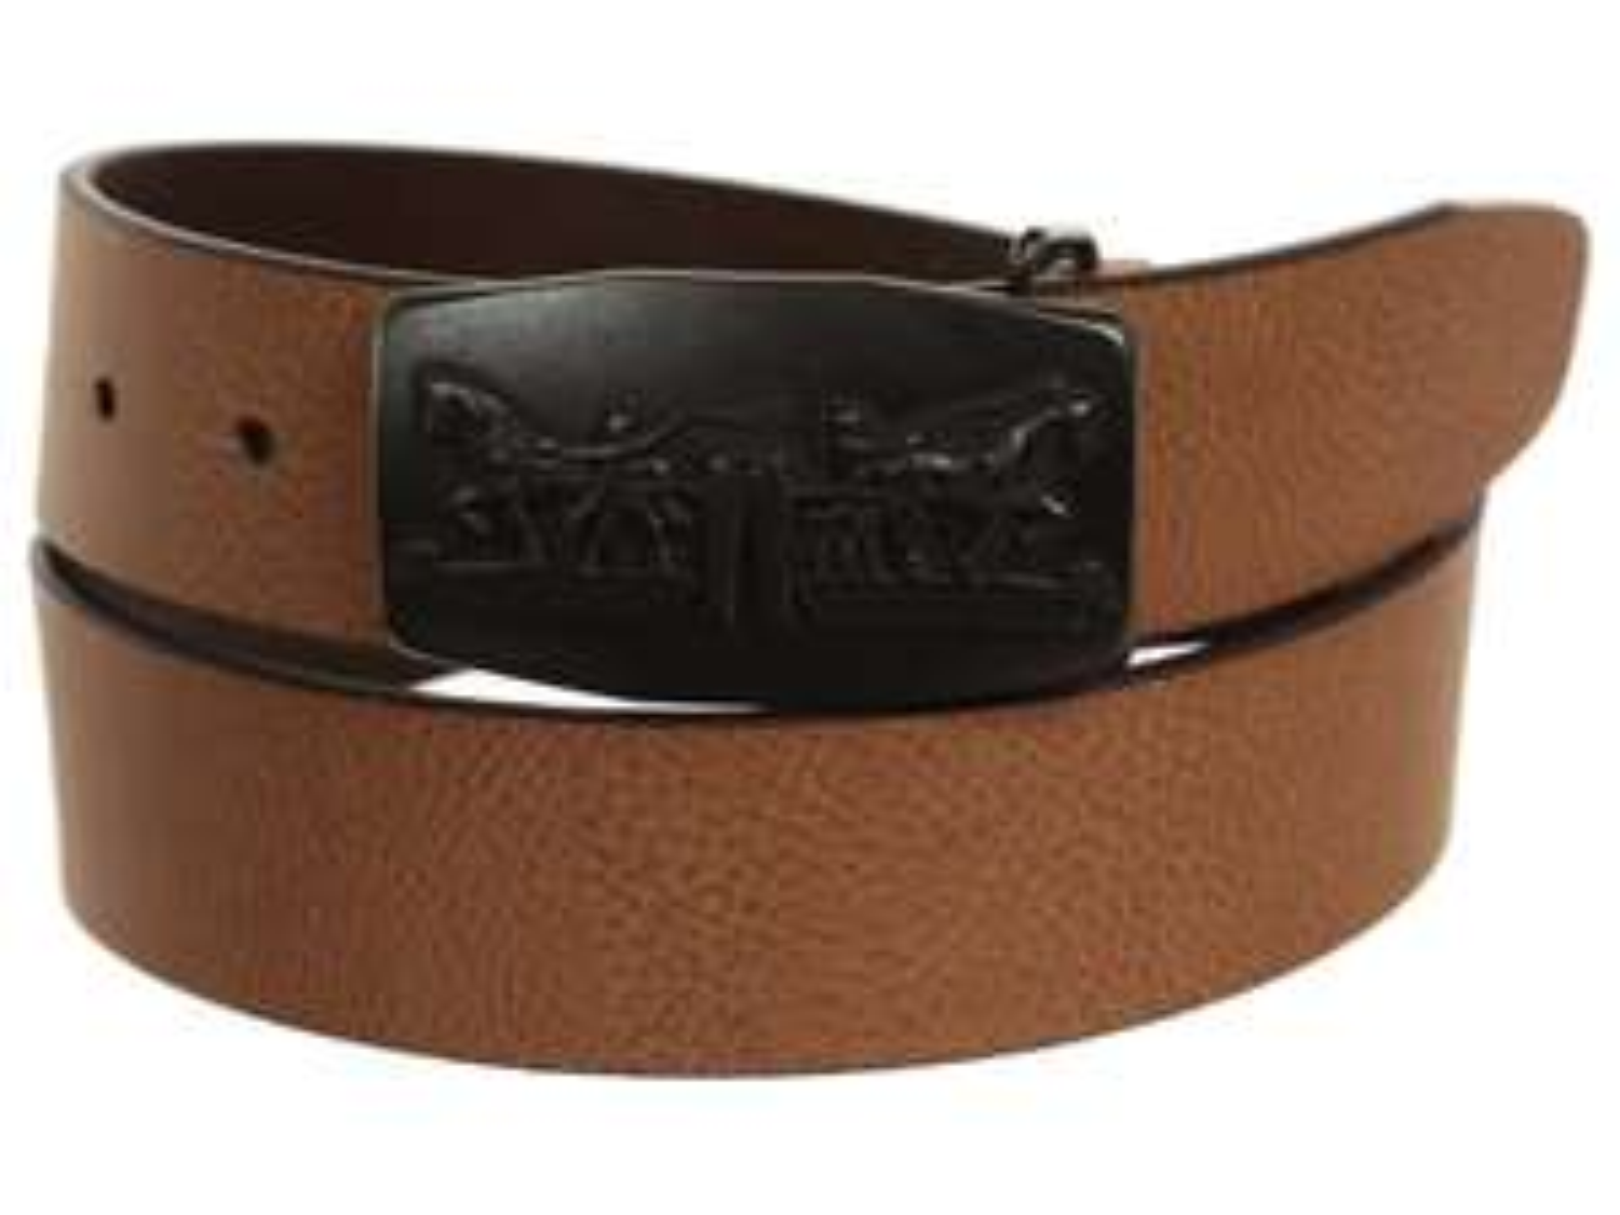 LIVERPOOL: Cinturón LEVI'S de $559 a $279